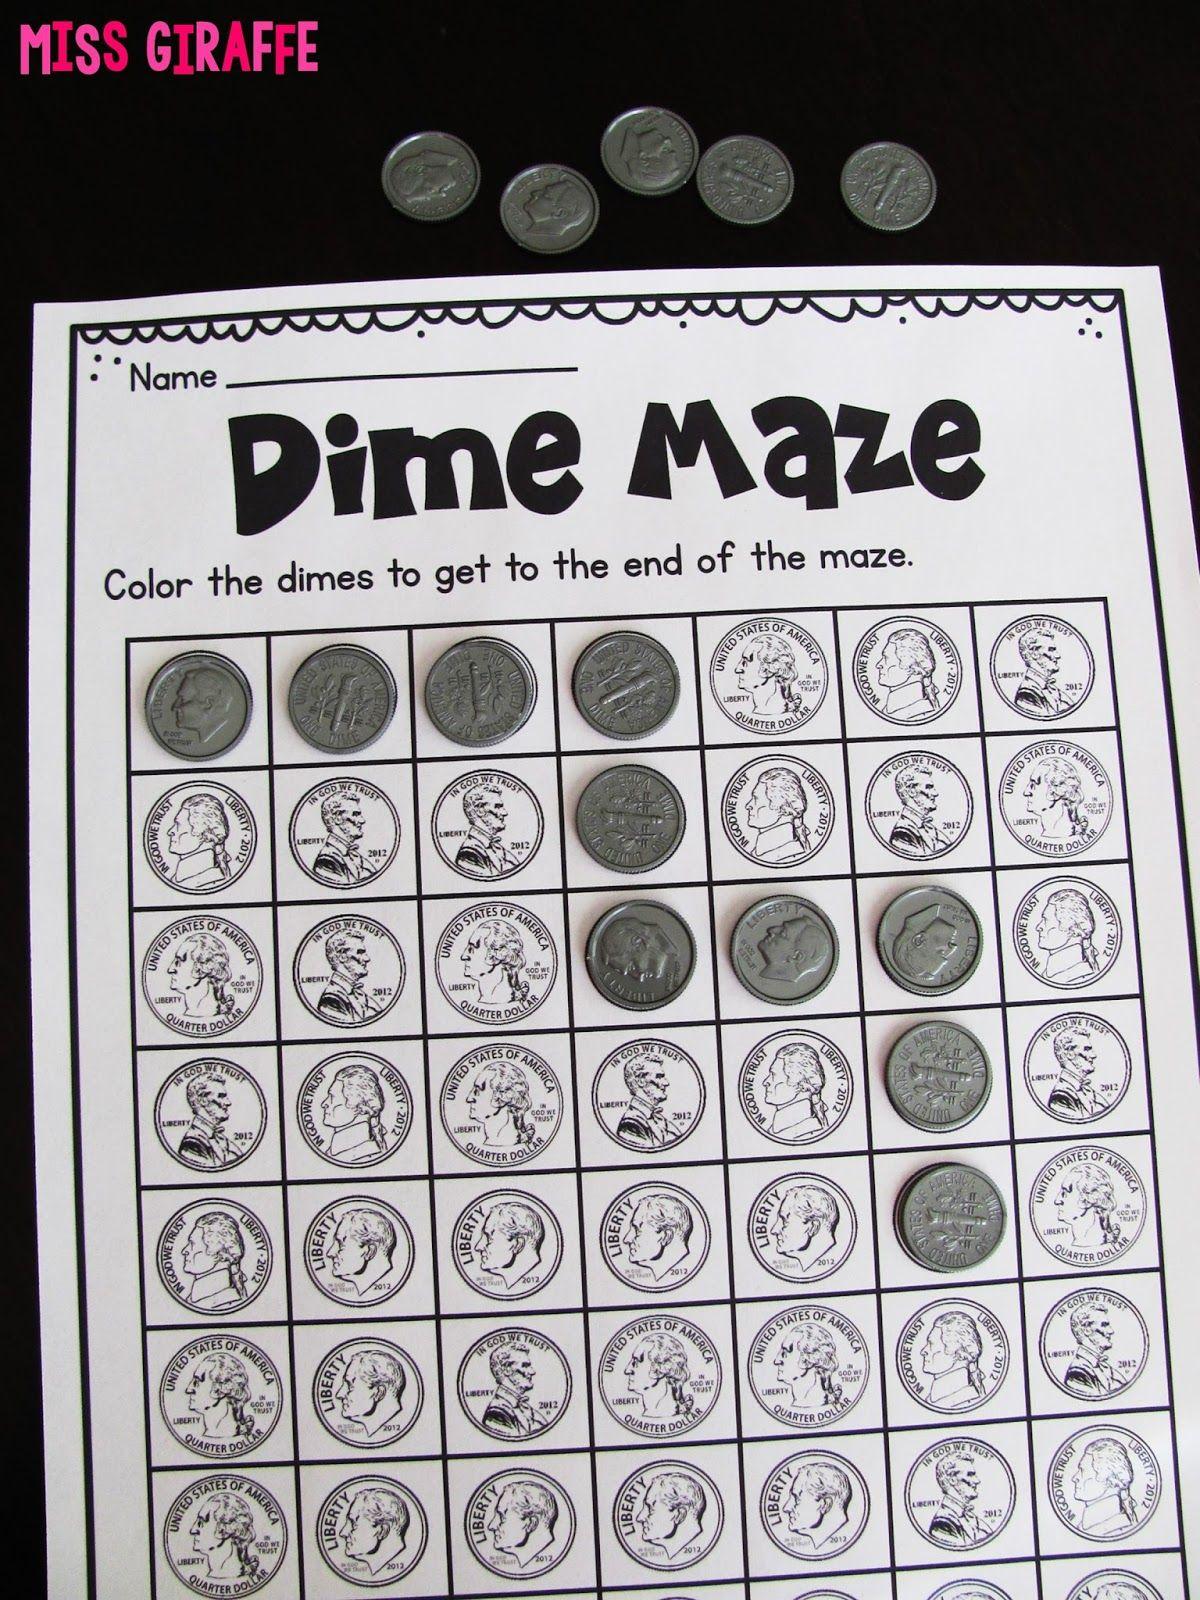 Id Coins Mazes 283 29 1 200 1 600 Pixels